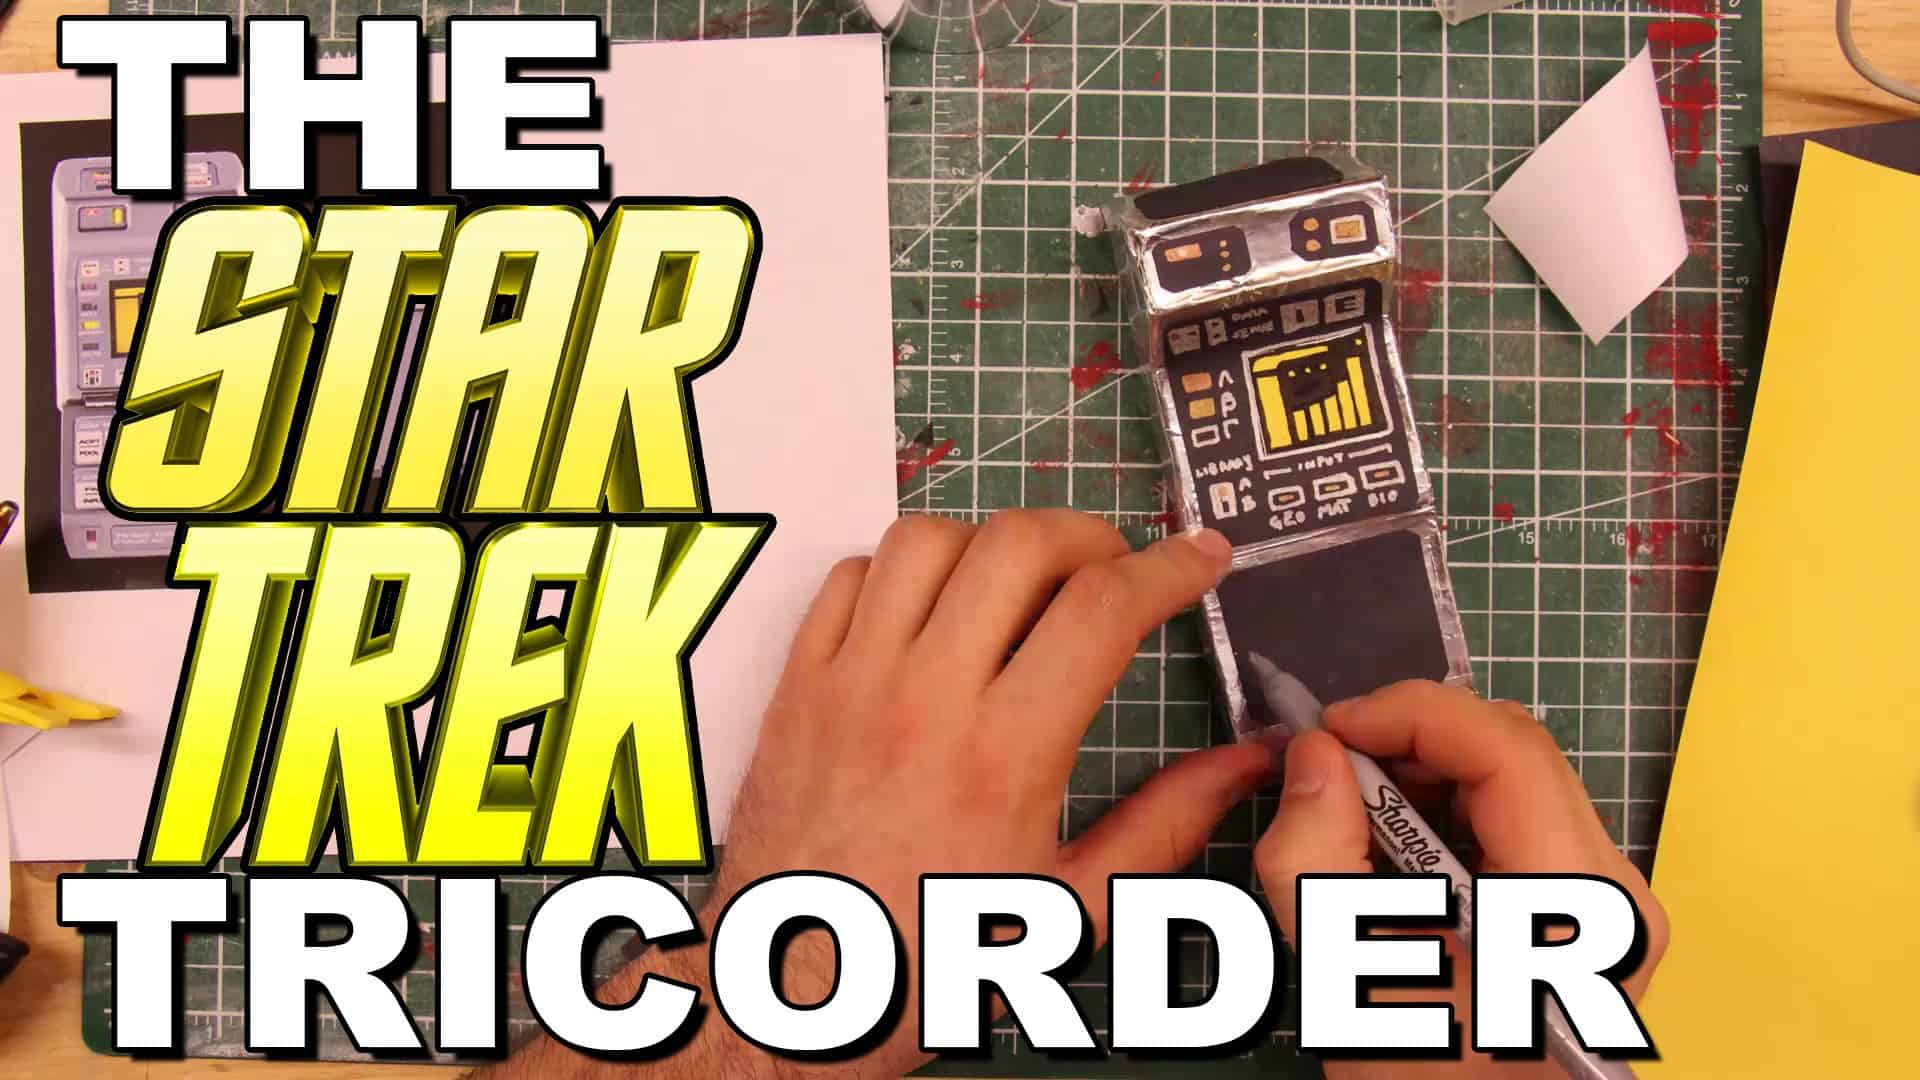 DIY Star Trek tricorder